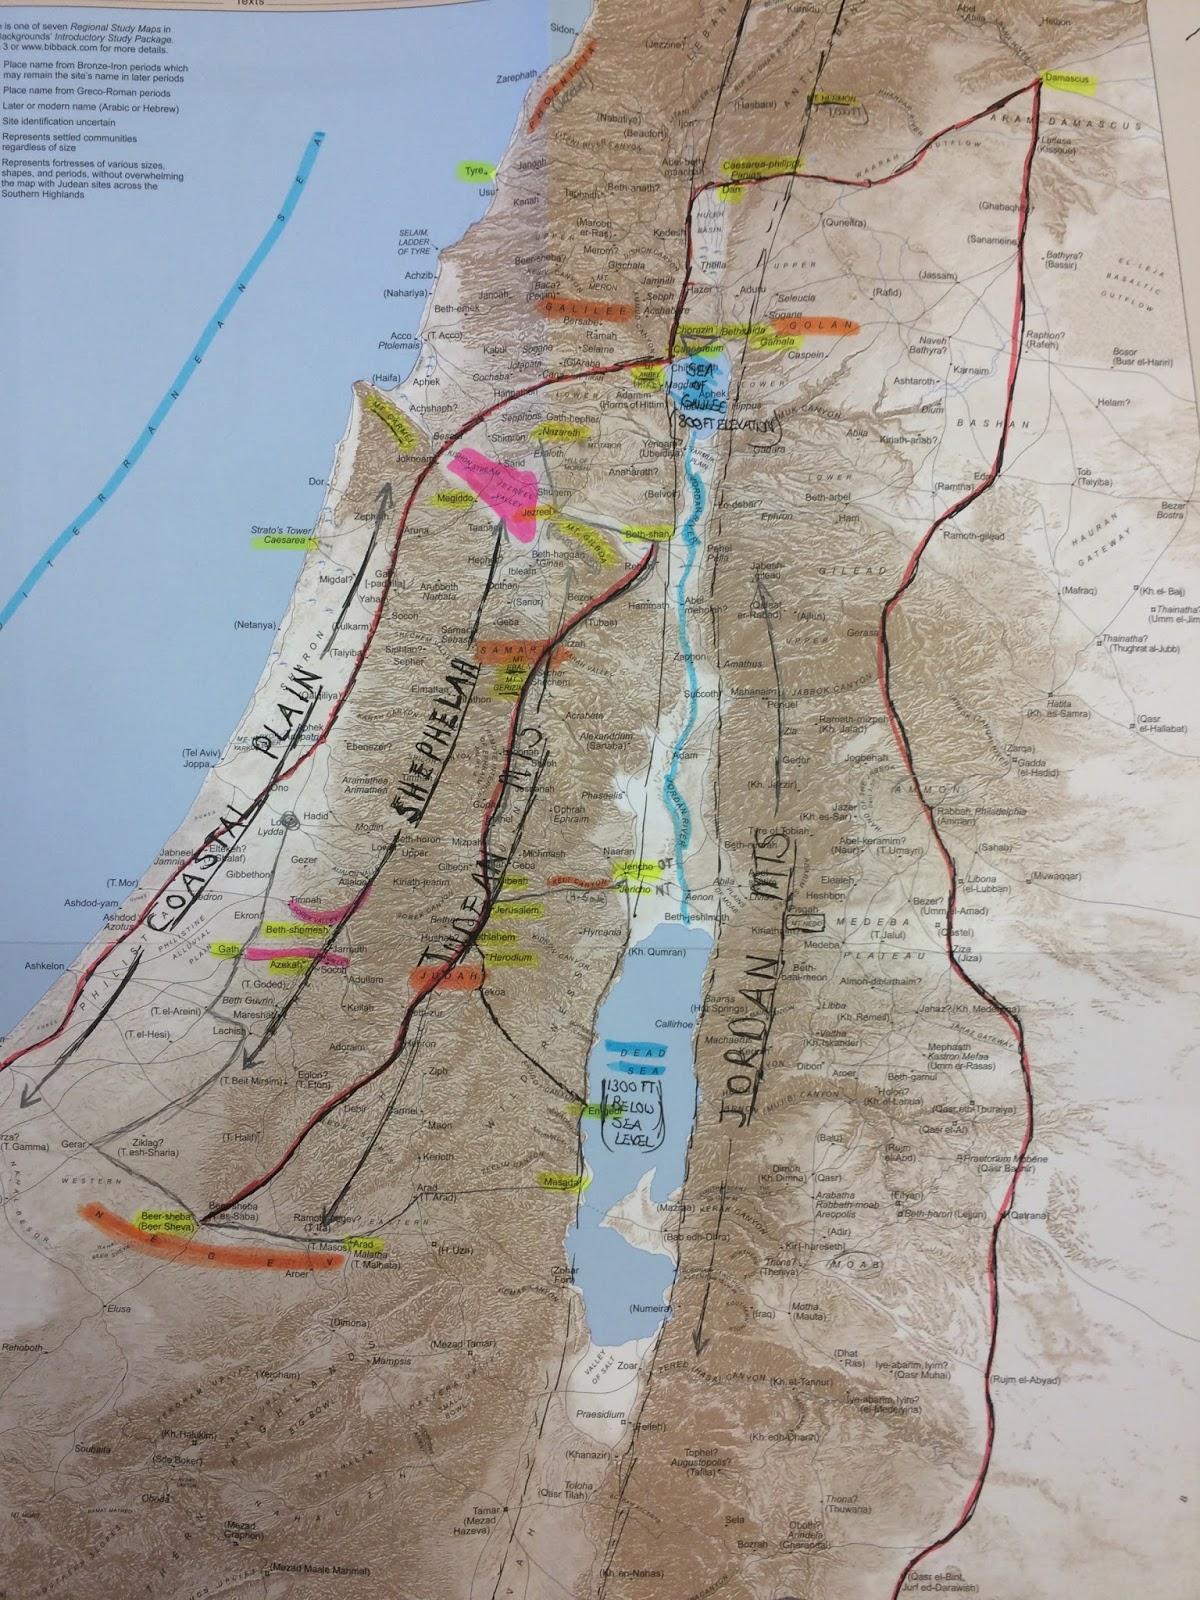 trip orientation call walking in the footsteps of jesus